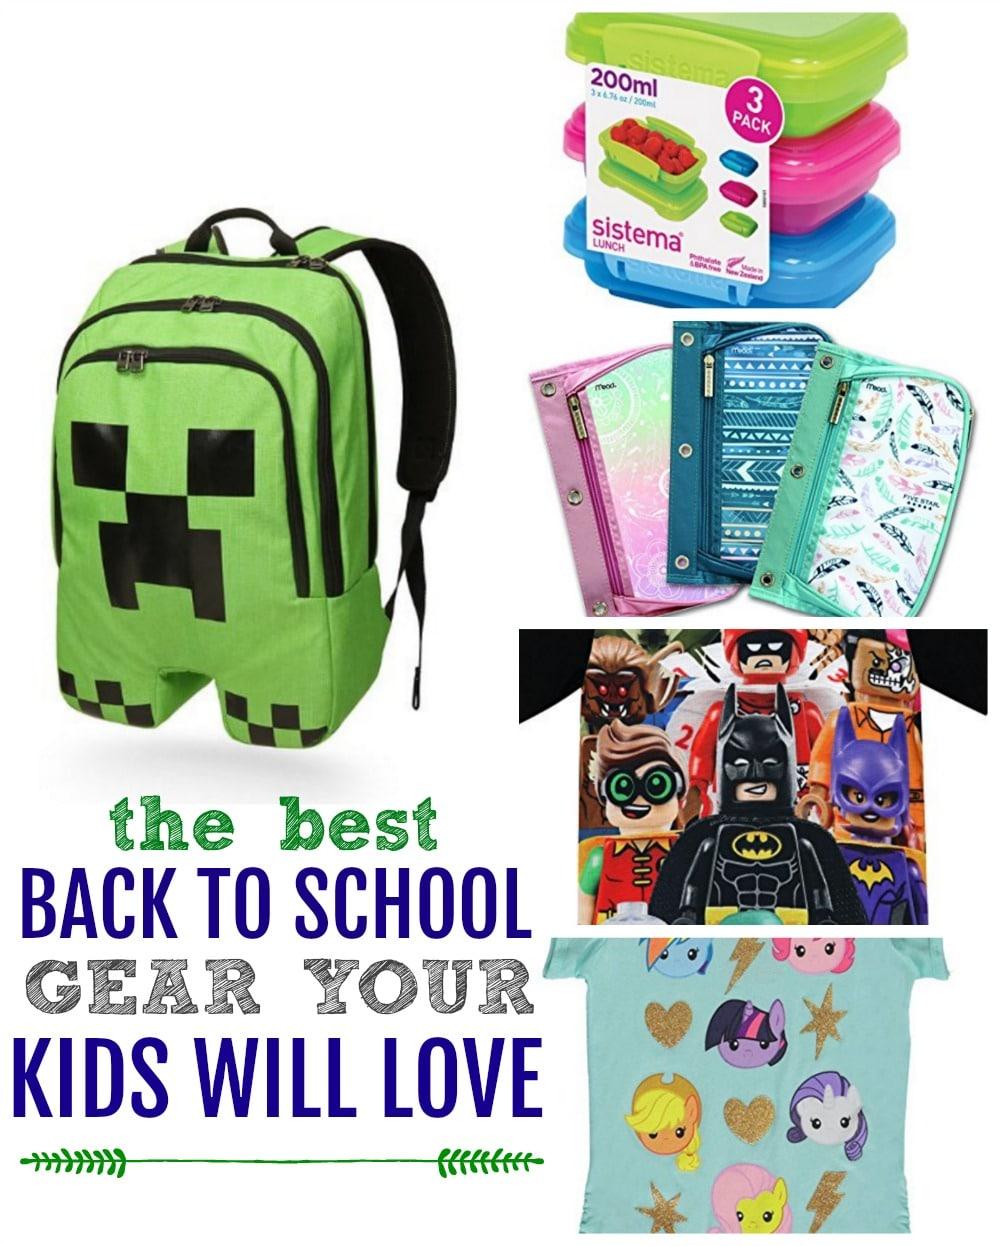 the best back to school gear